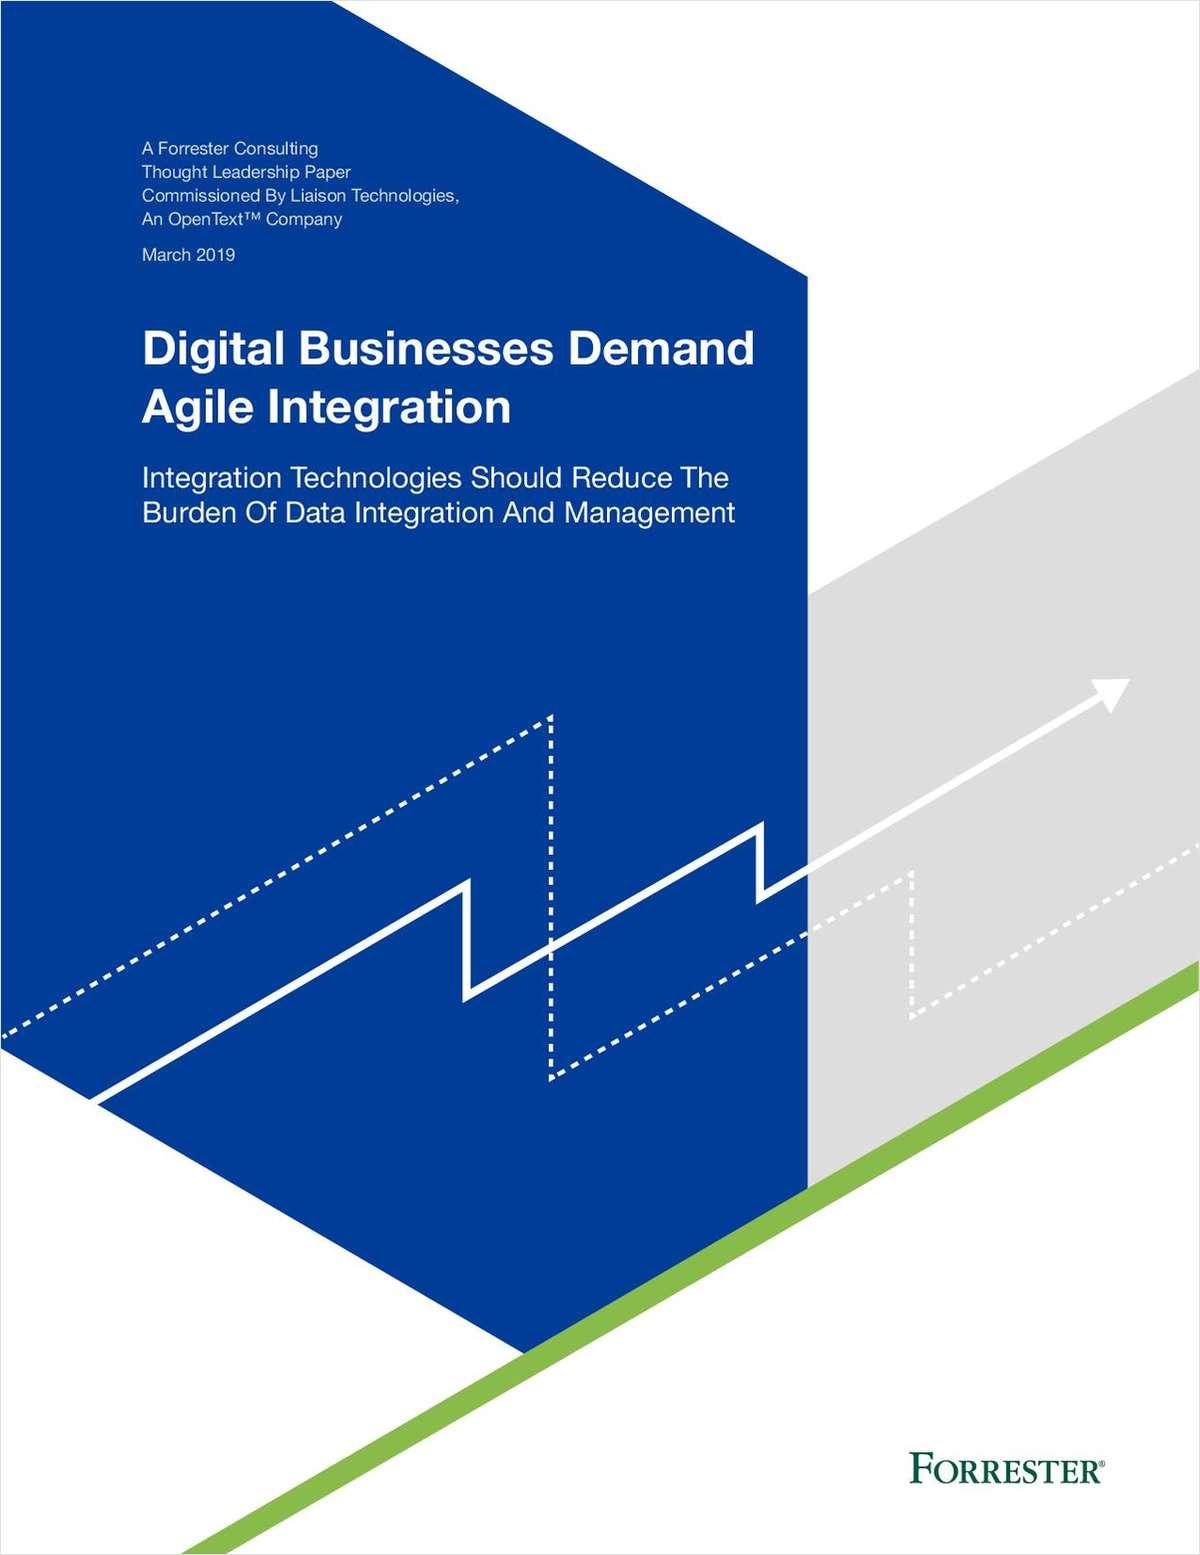 Digital Businesses Demand Agile Integration